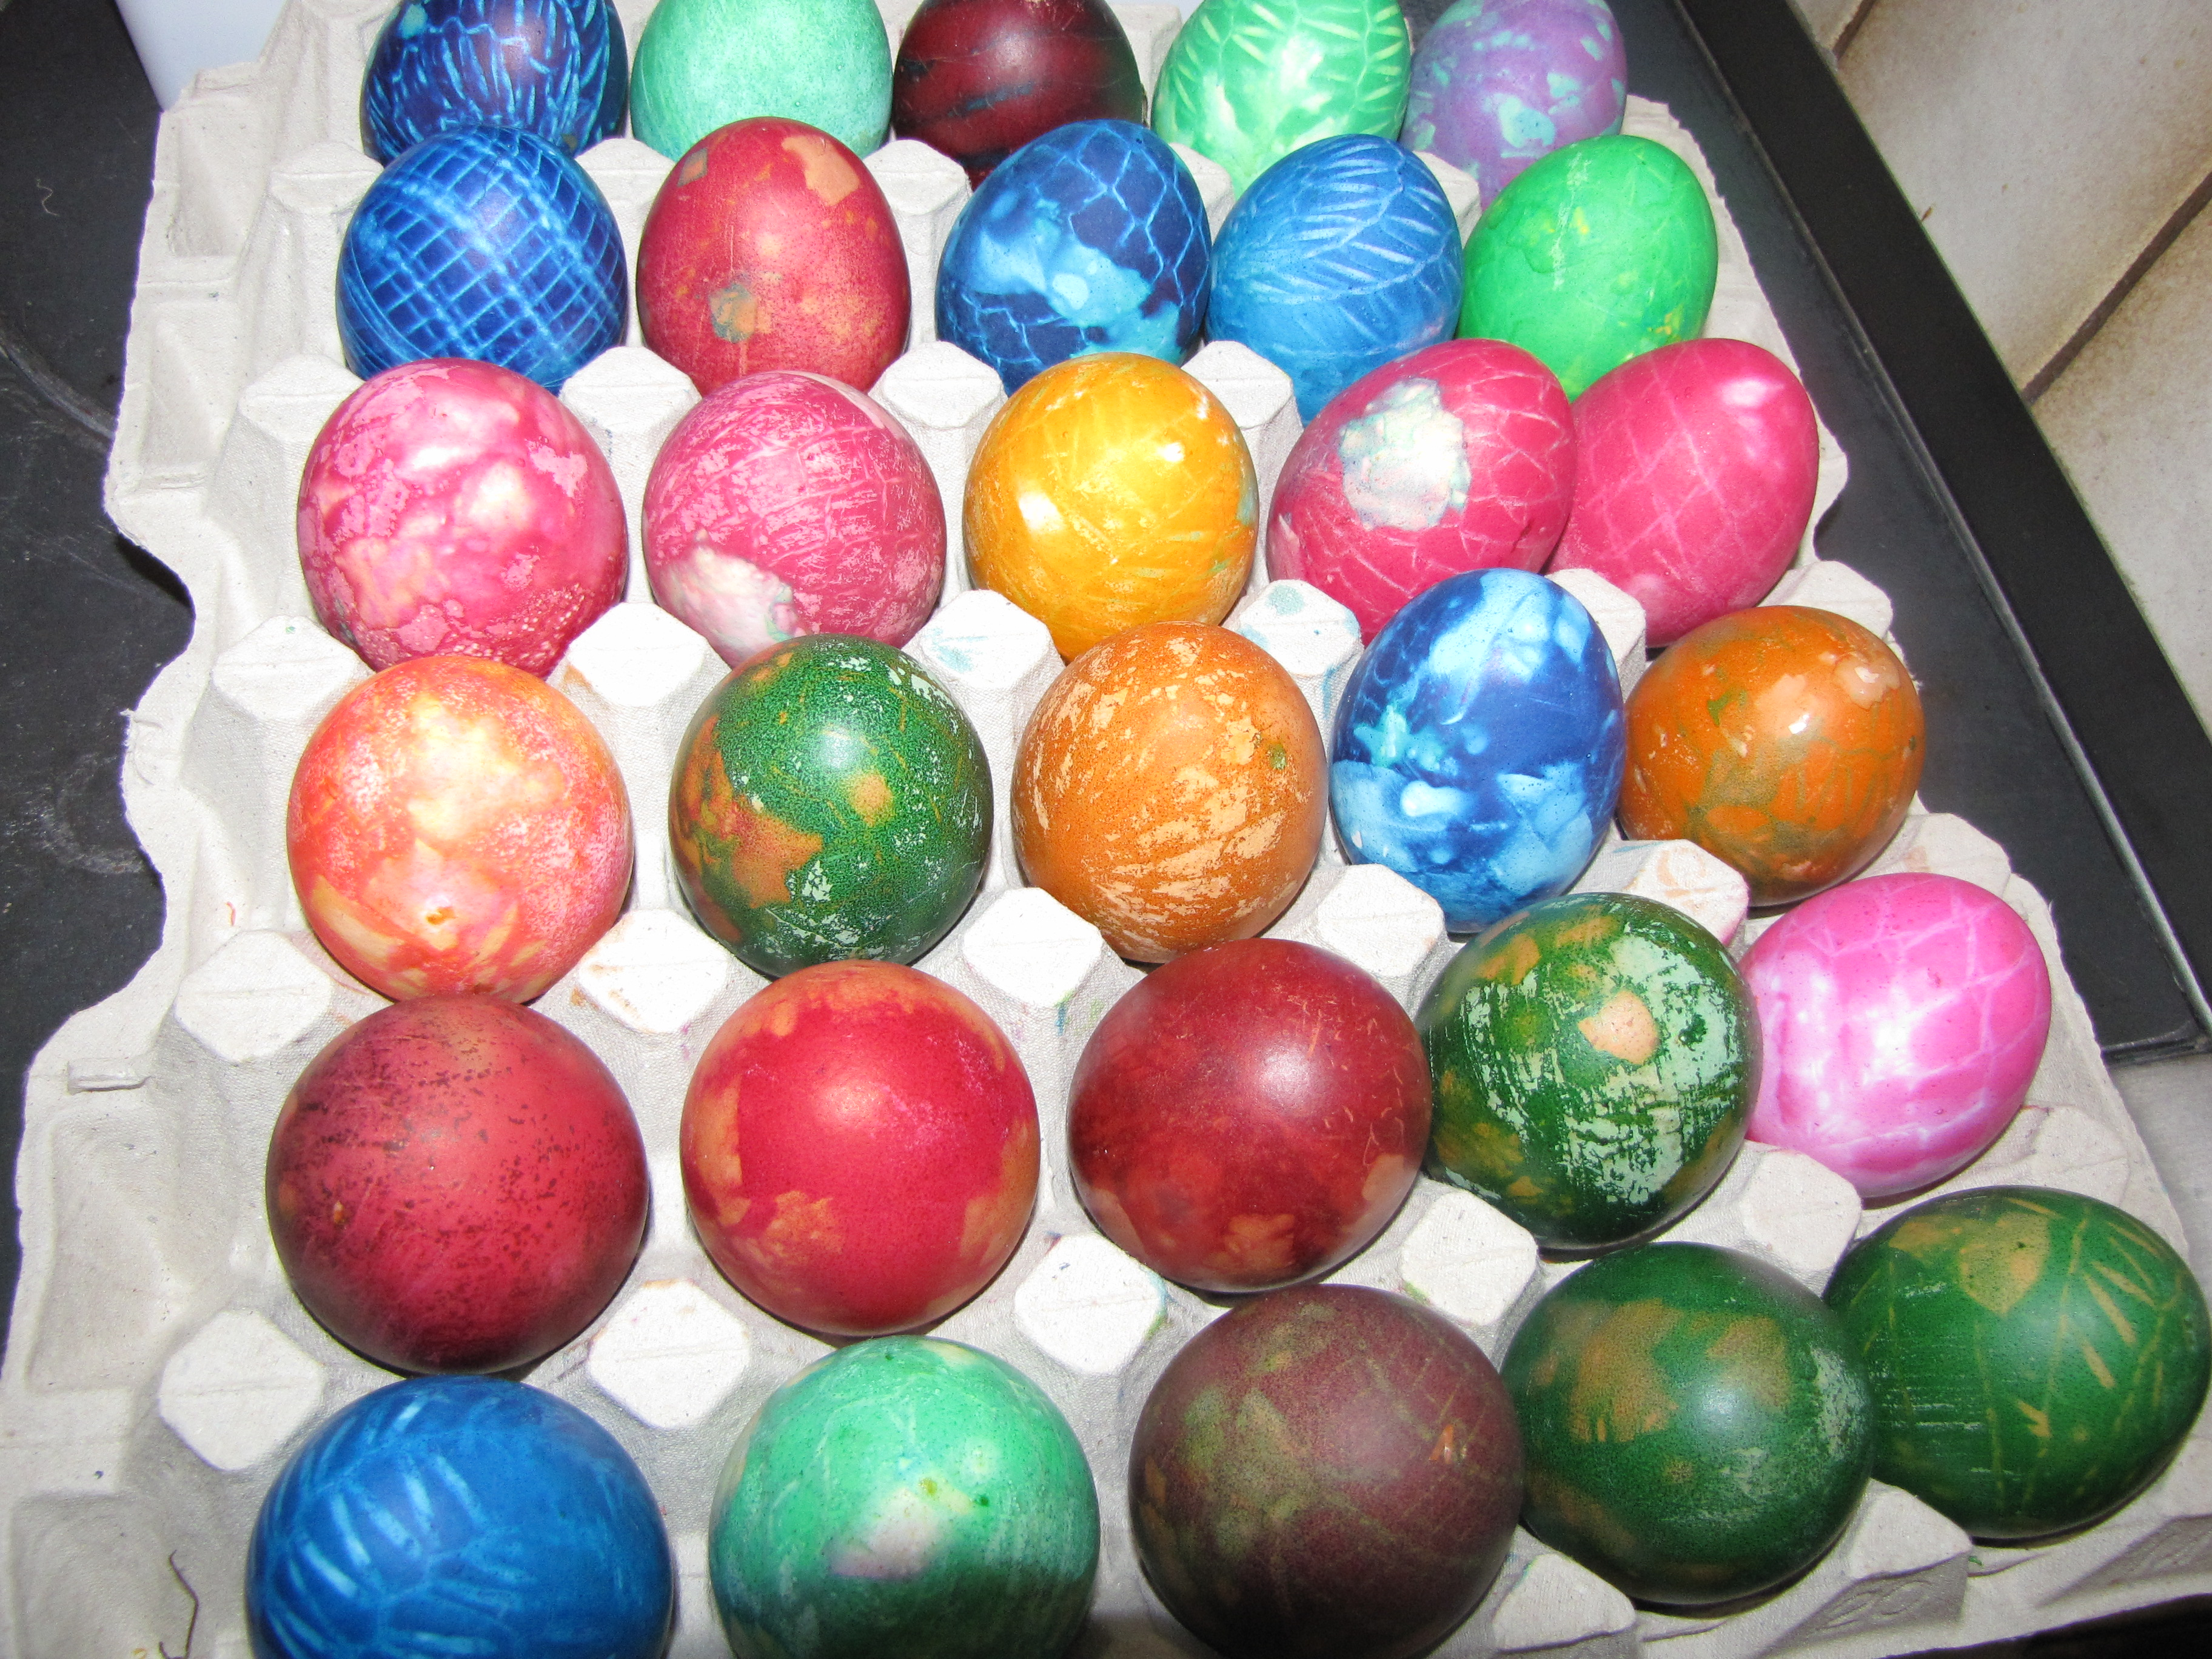 Eier färben am Gründonnerstag - Blog des TVB Annaberg-Lungötz